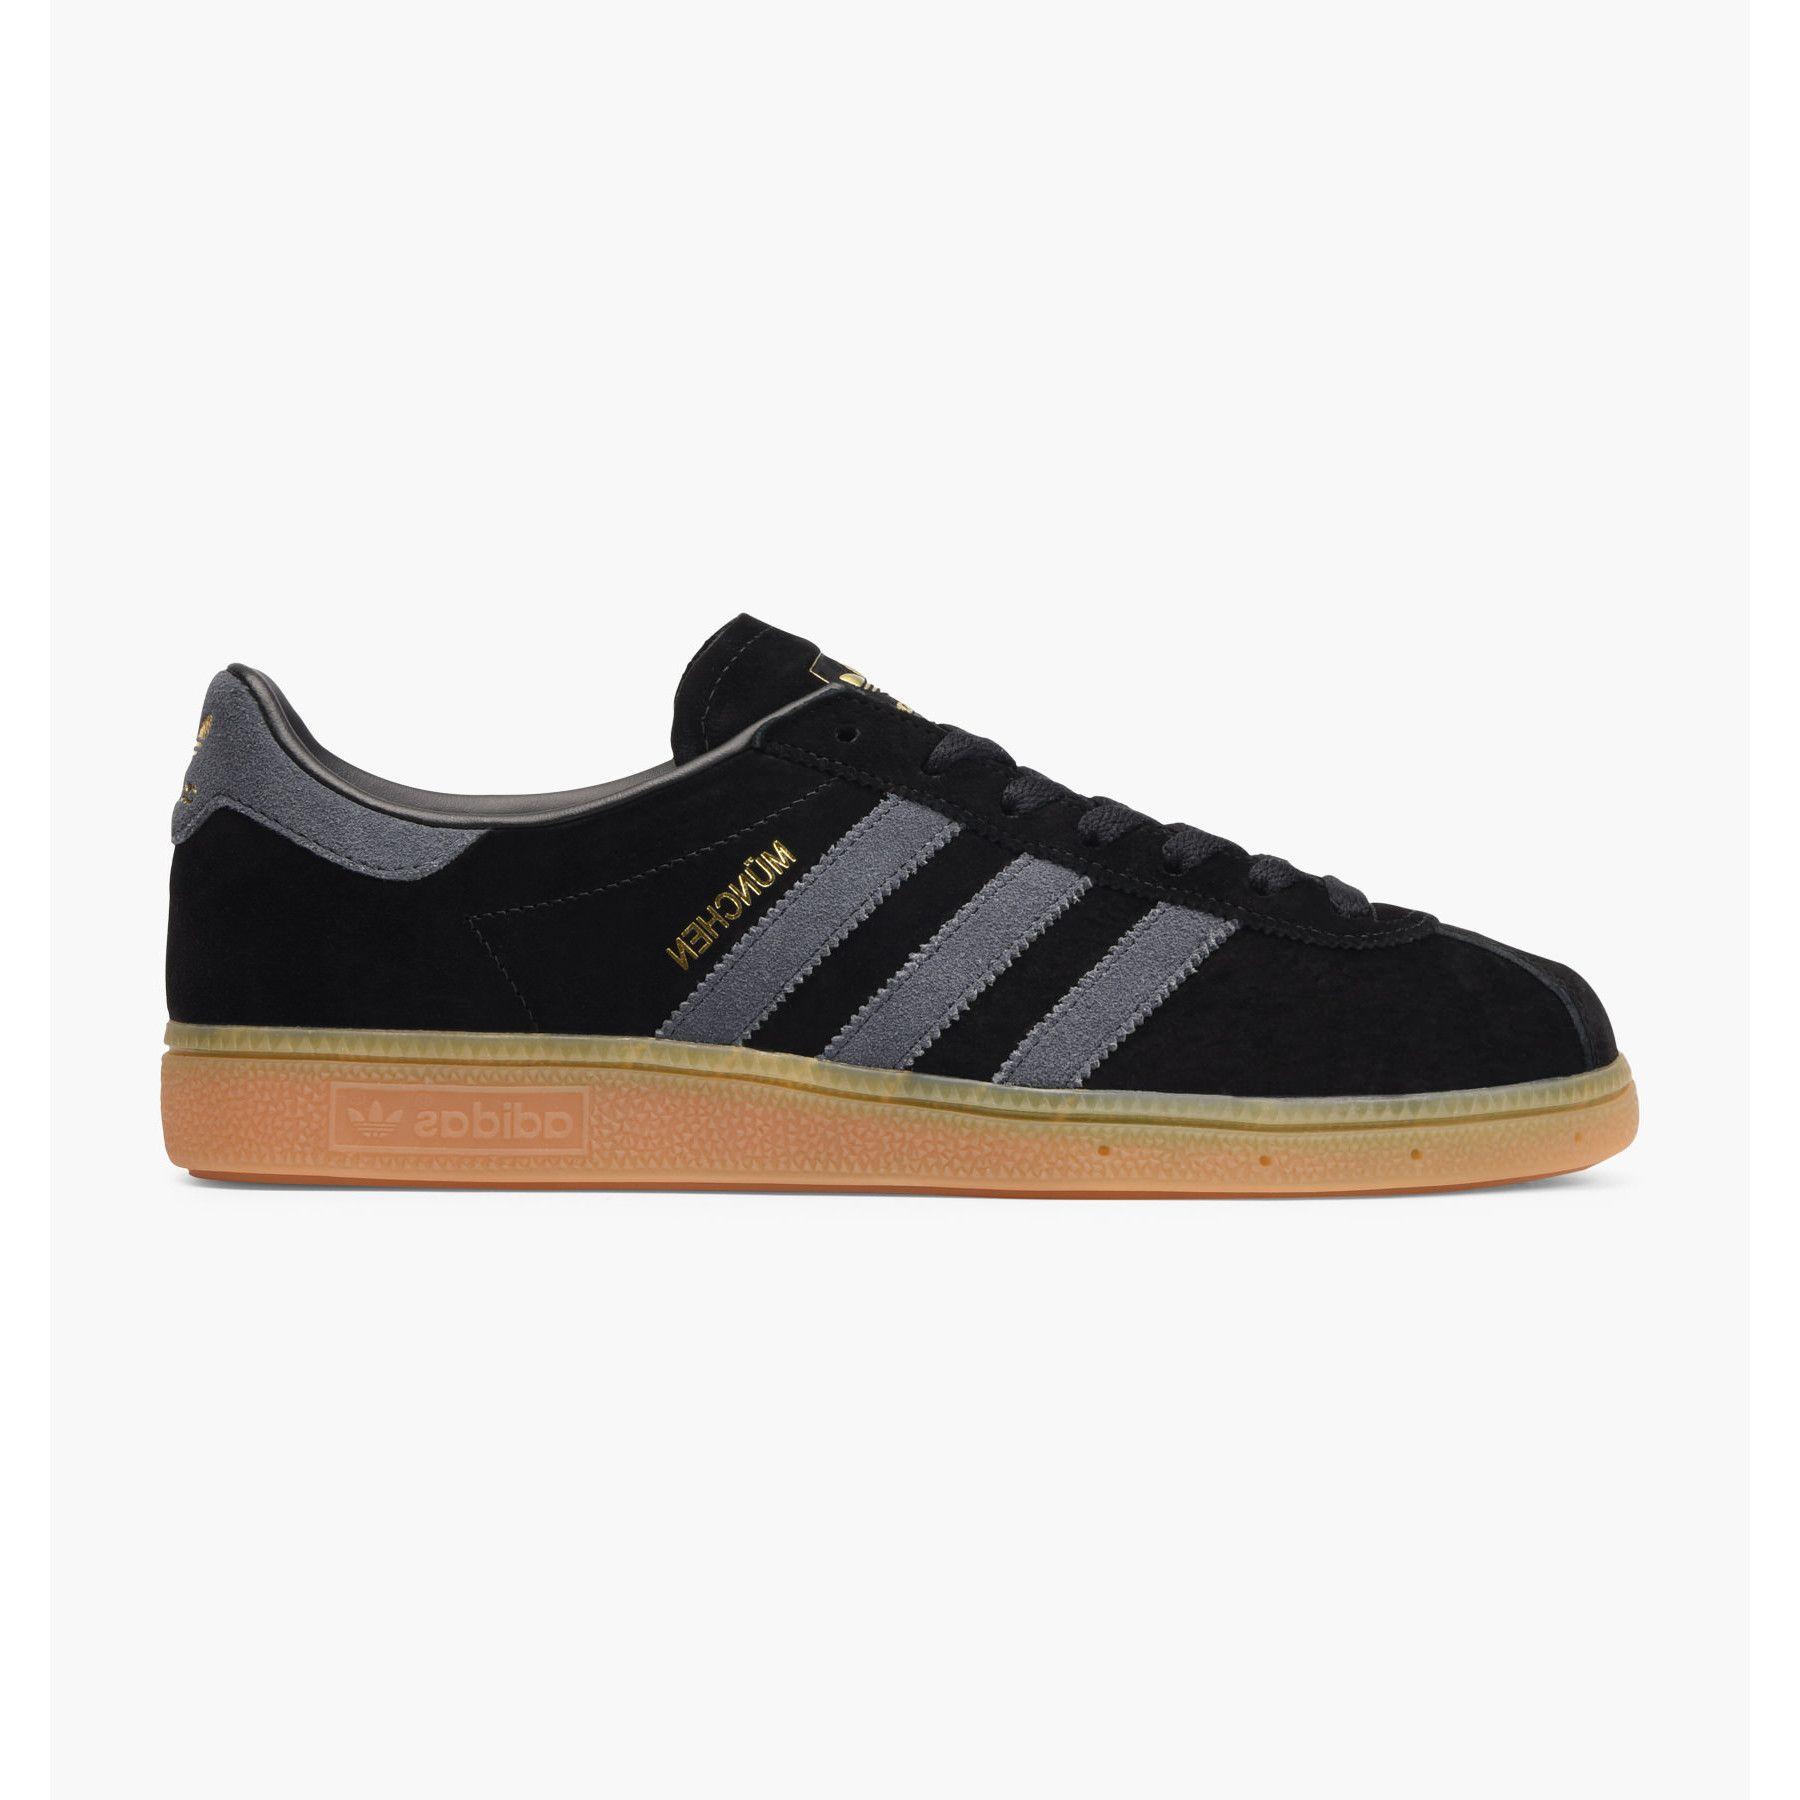 Pantofi Sport Adidas Munchen, Barbati, Negru BB5295 43 1/2 EU